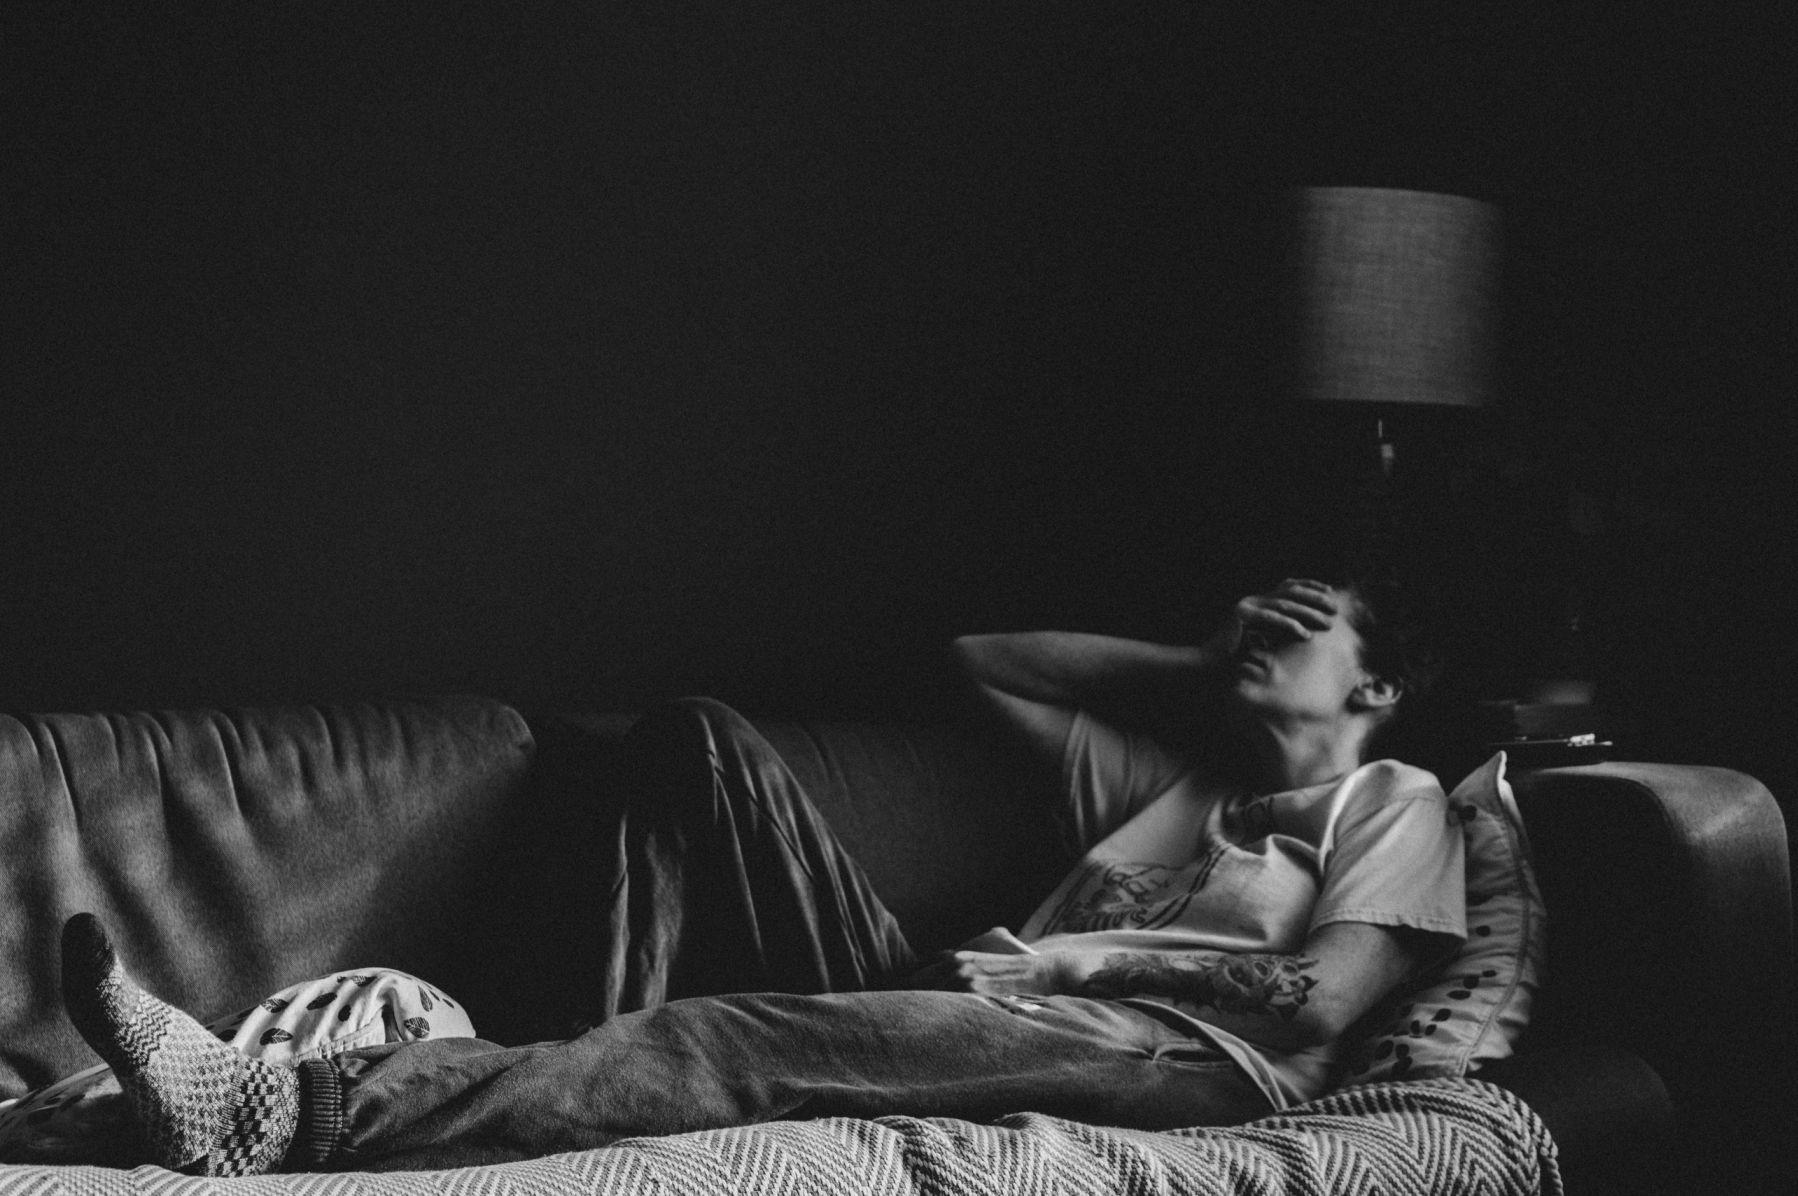 Relationship Between Sleep and Addiction